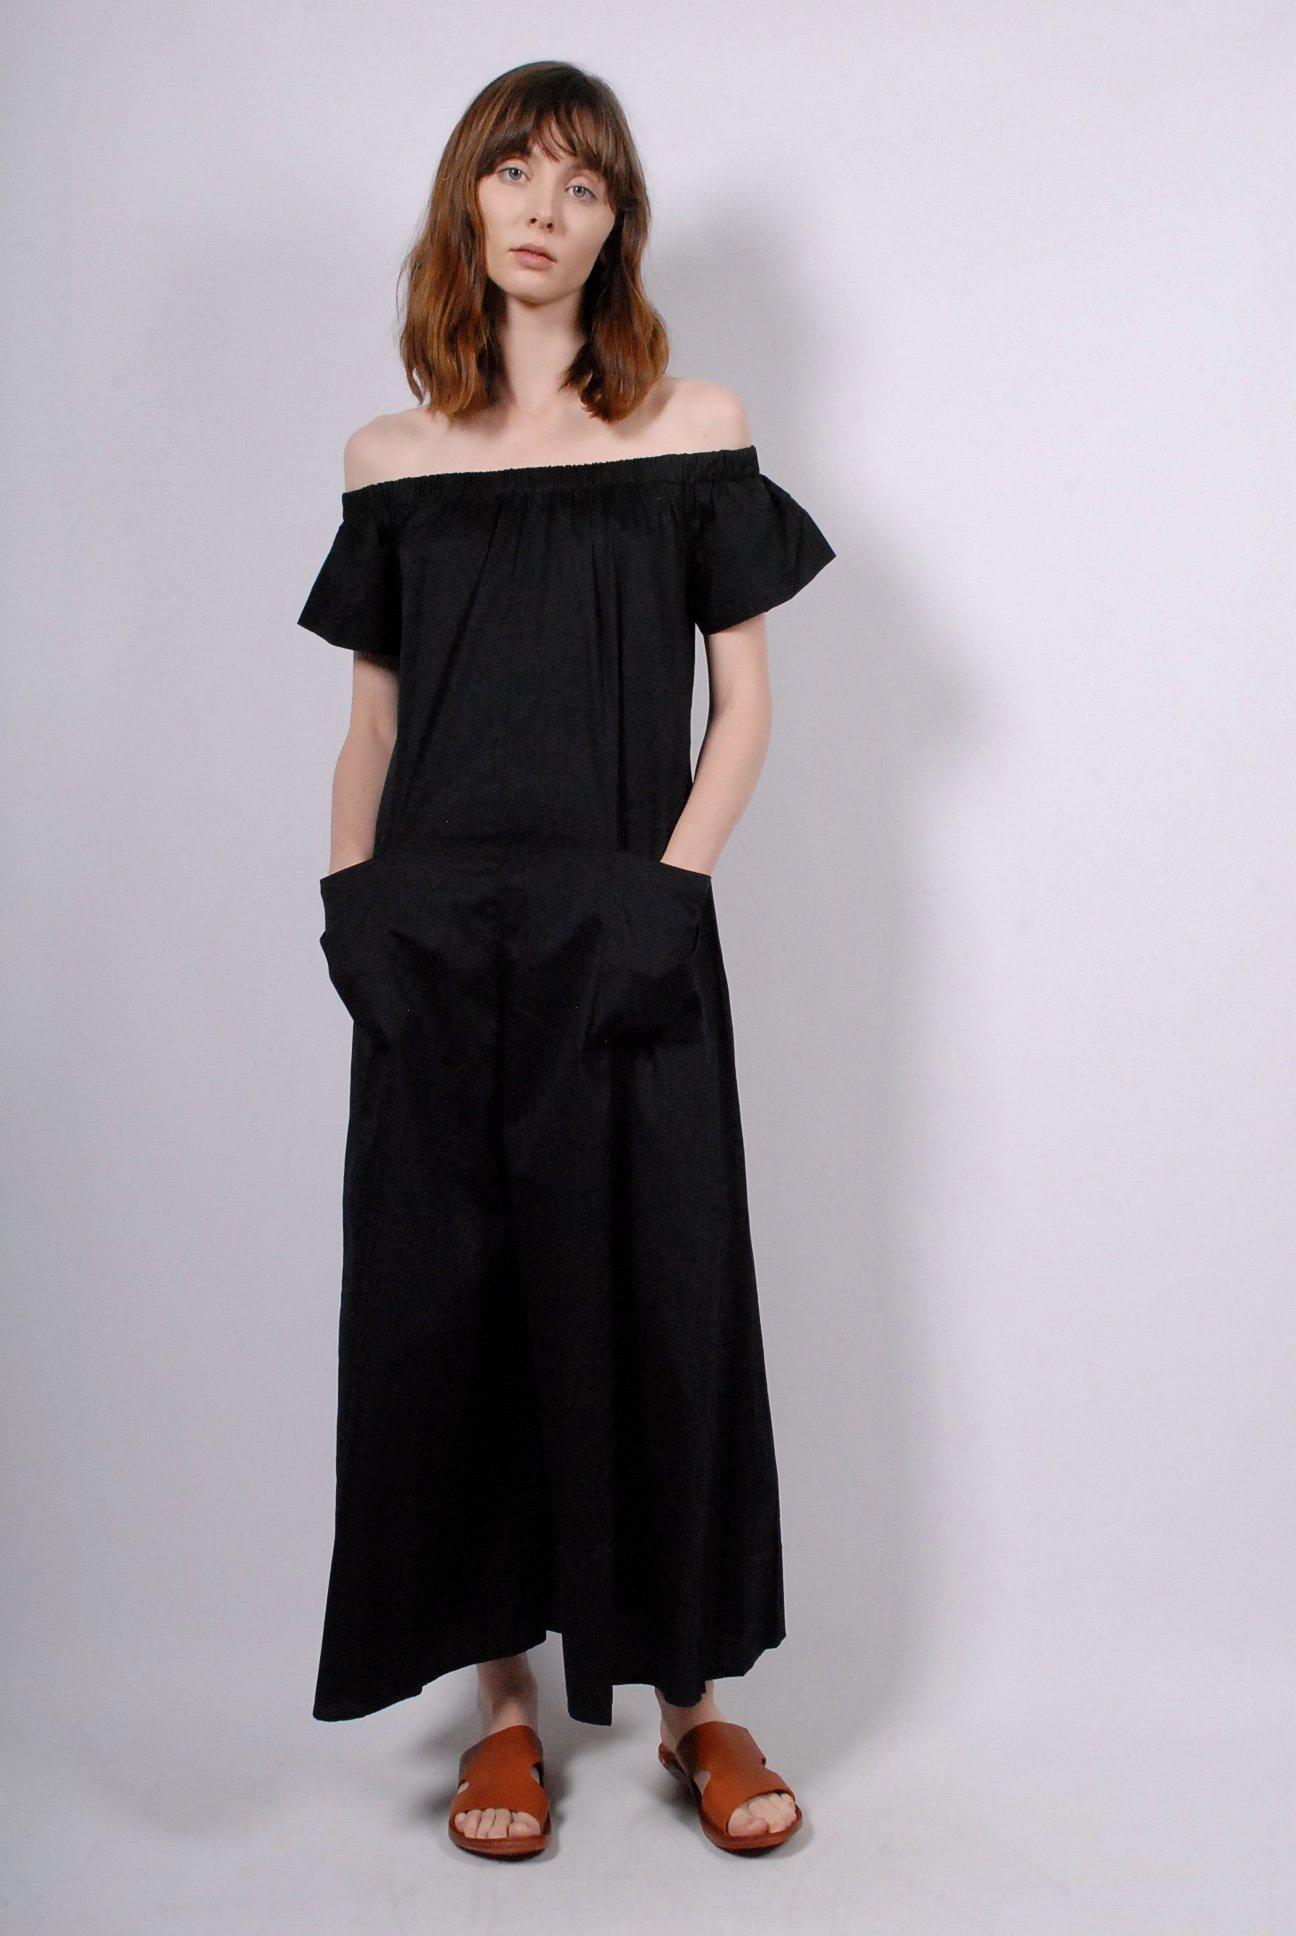 8221c76057e Lyst - Mara Hoffman Blanche Jumpsuit in Black